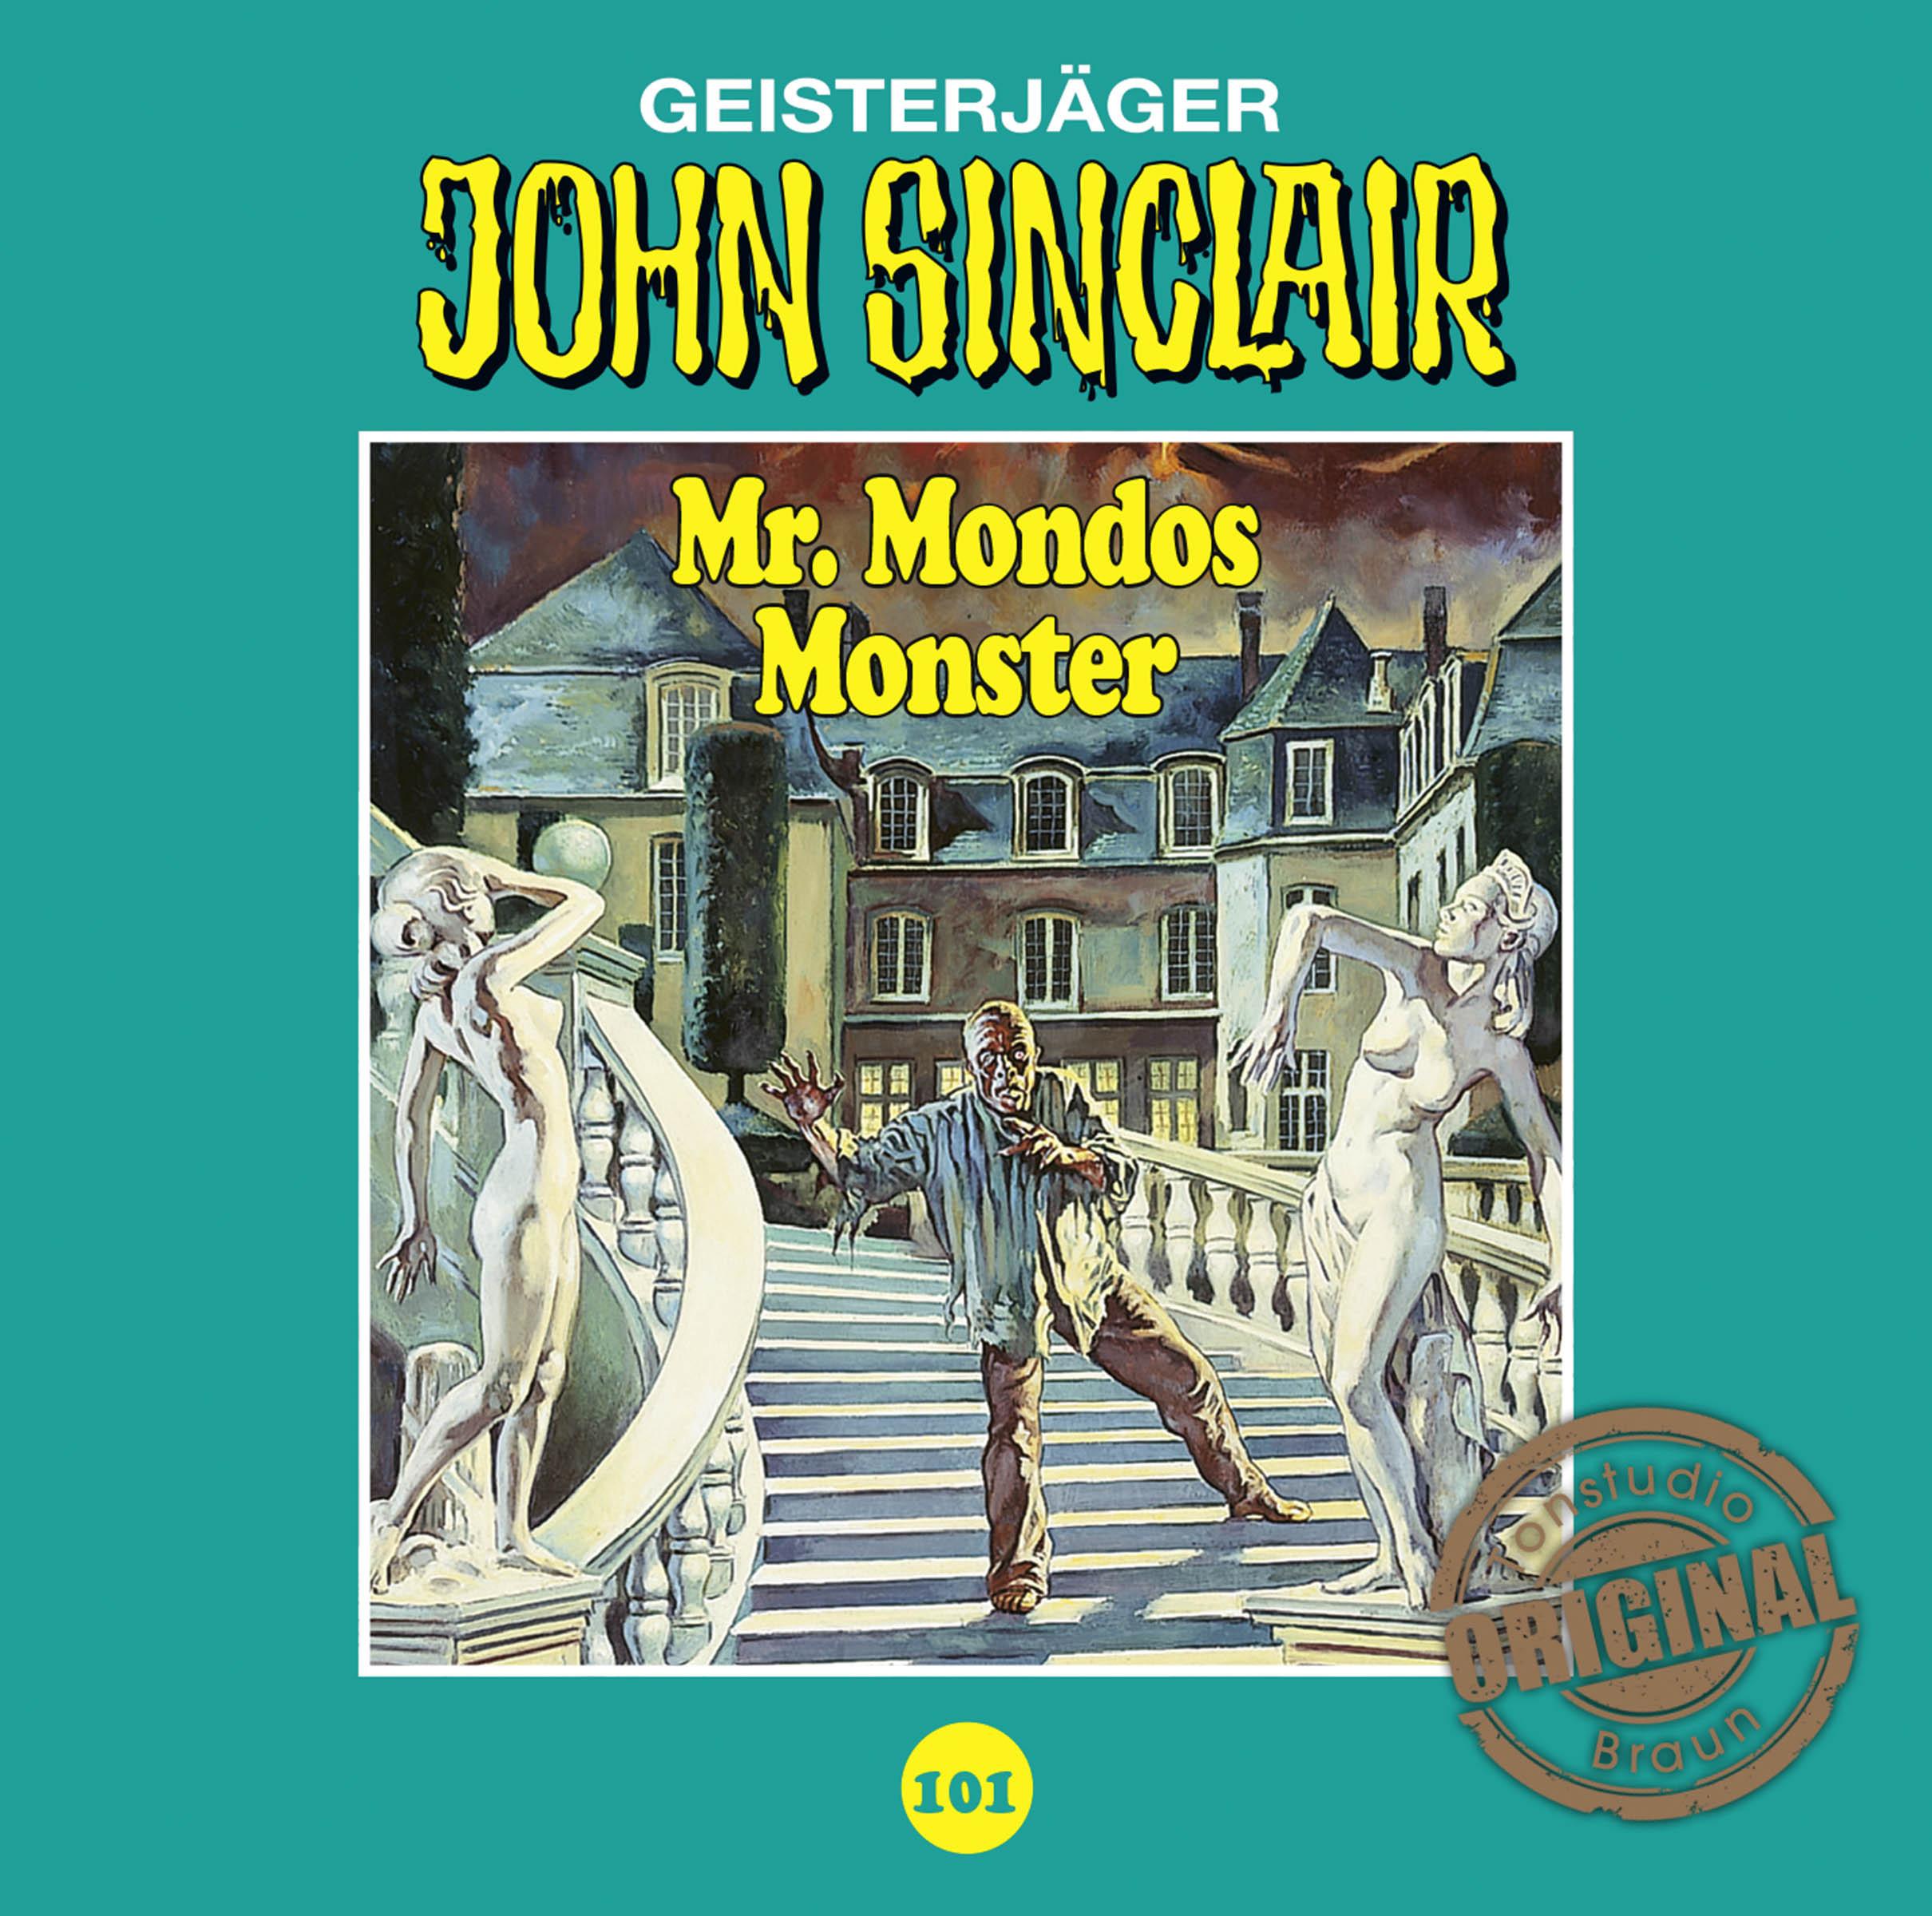 John Sinclair Tonstudio Braun - Folge 101: Mr. Mondos Monster (Teil 1 von 2)